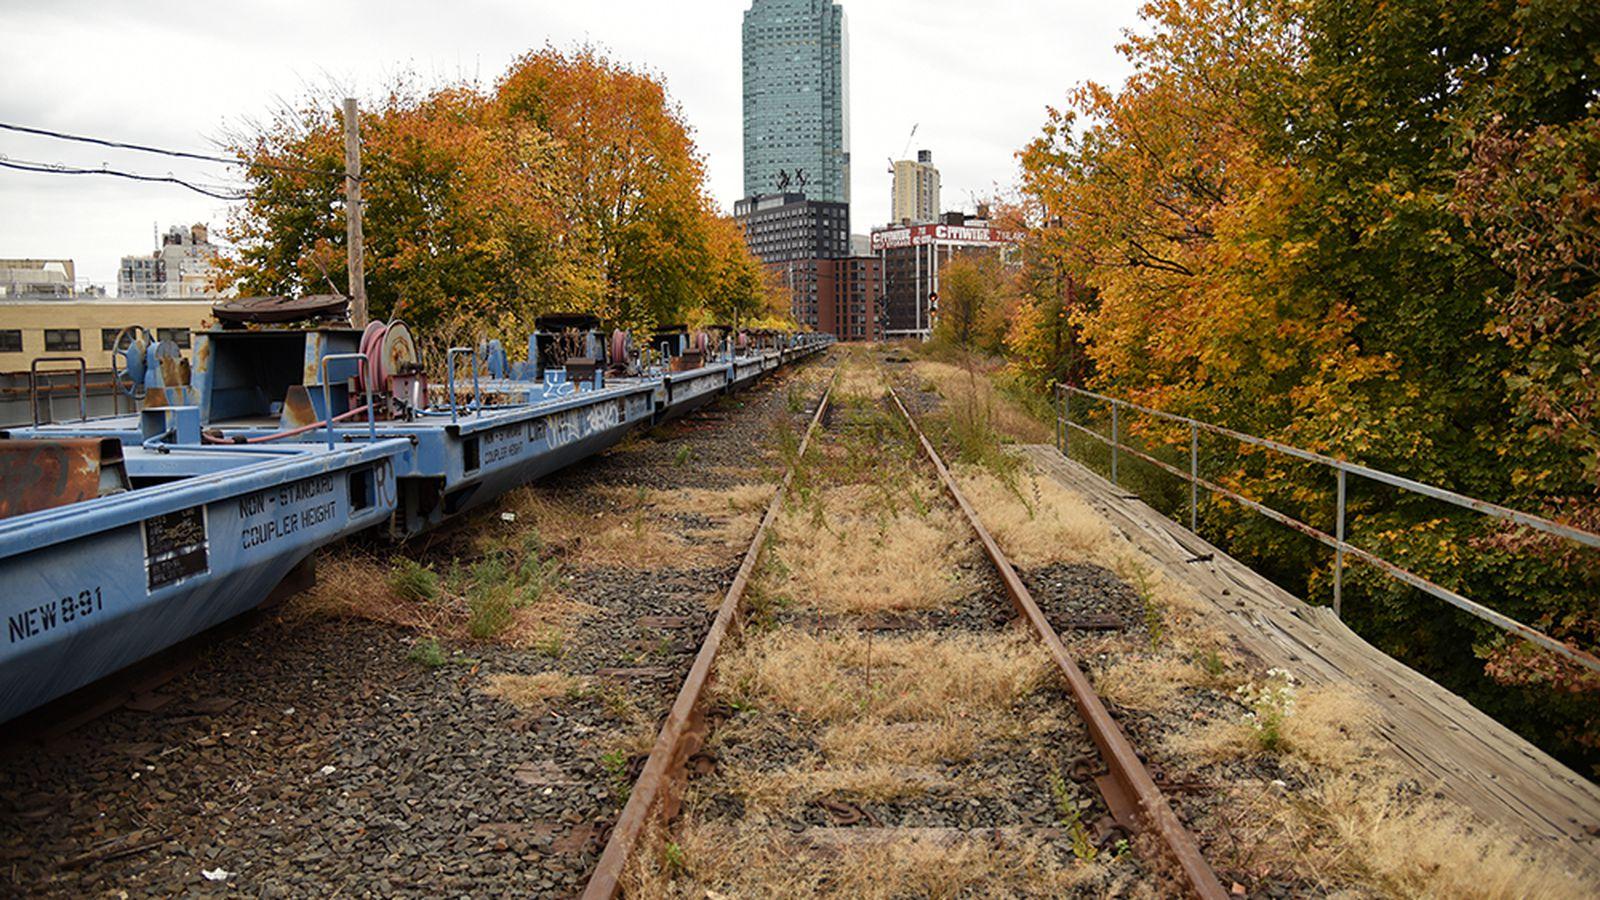 Celebrity model railway enthusiasts club